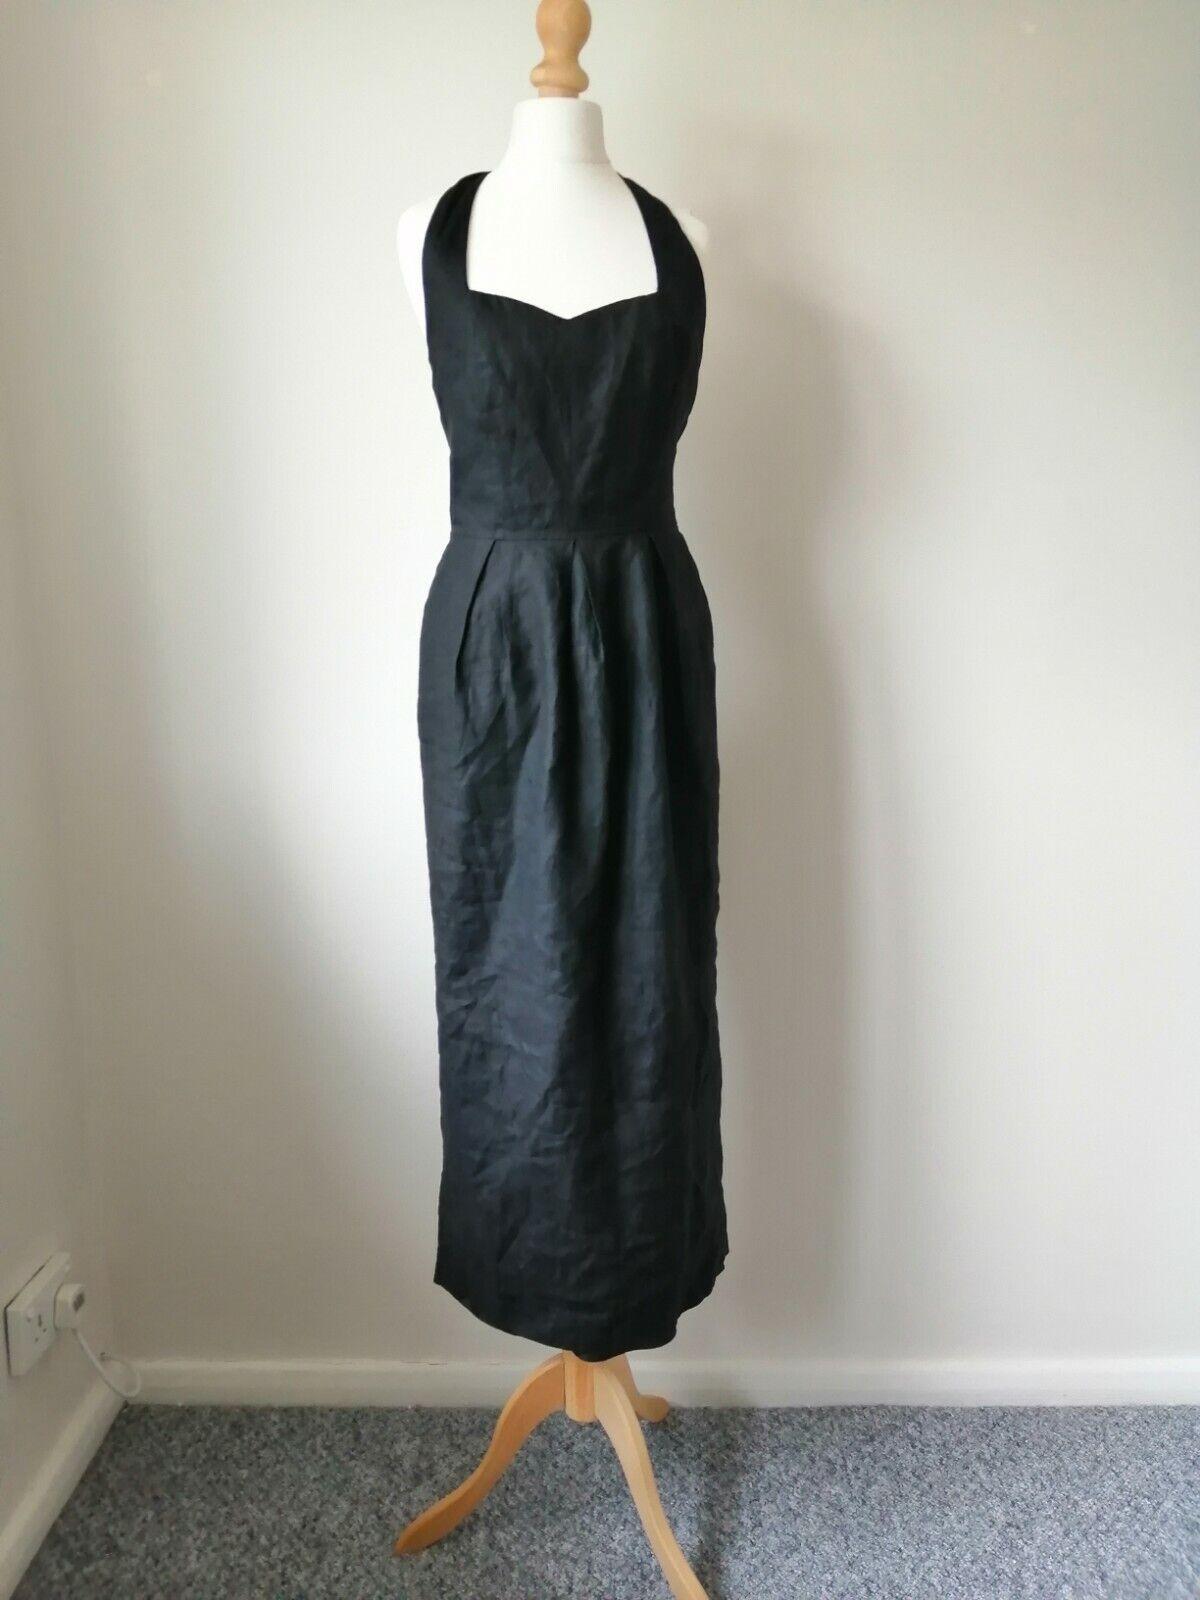 Genuine Vintage 1980s Laura Ashley Black Maxi Dress. Size 8/10